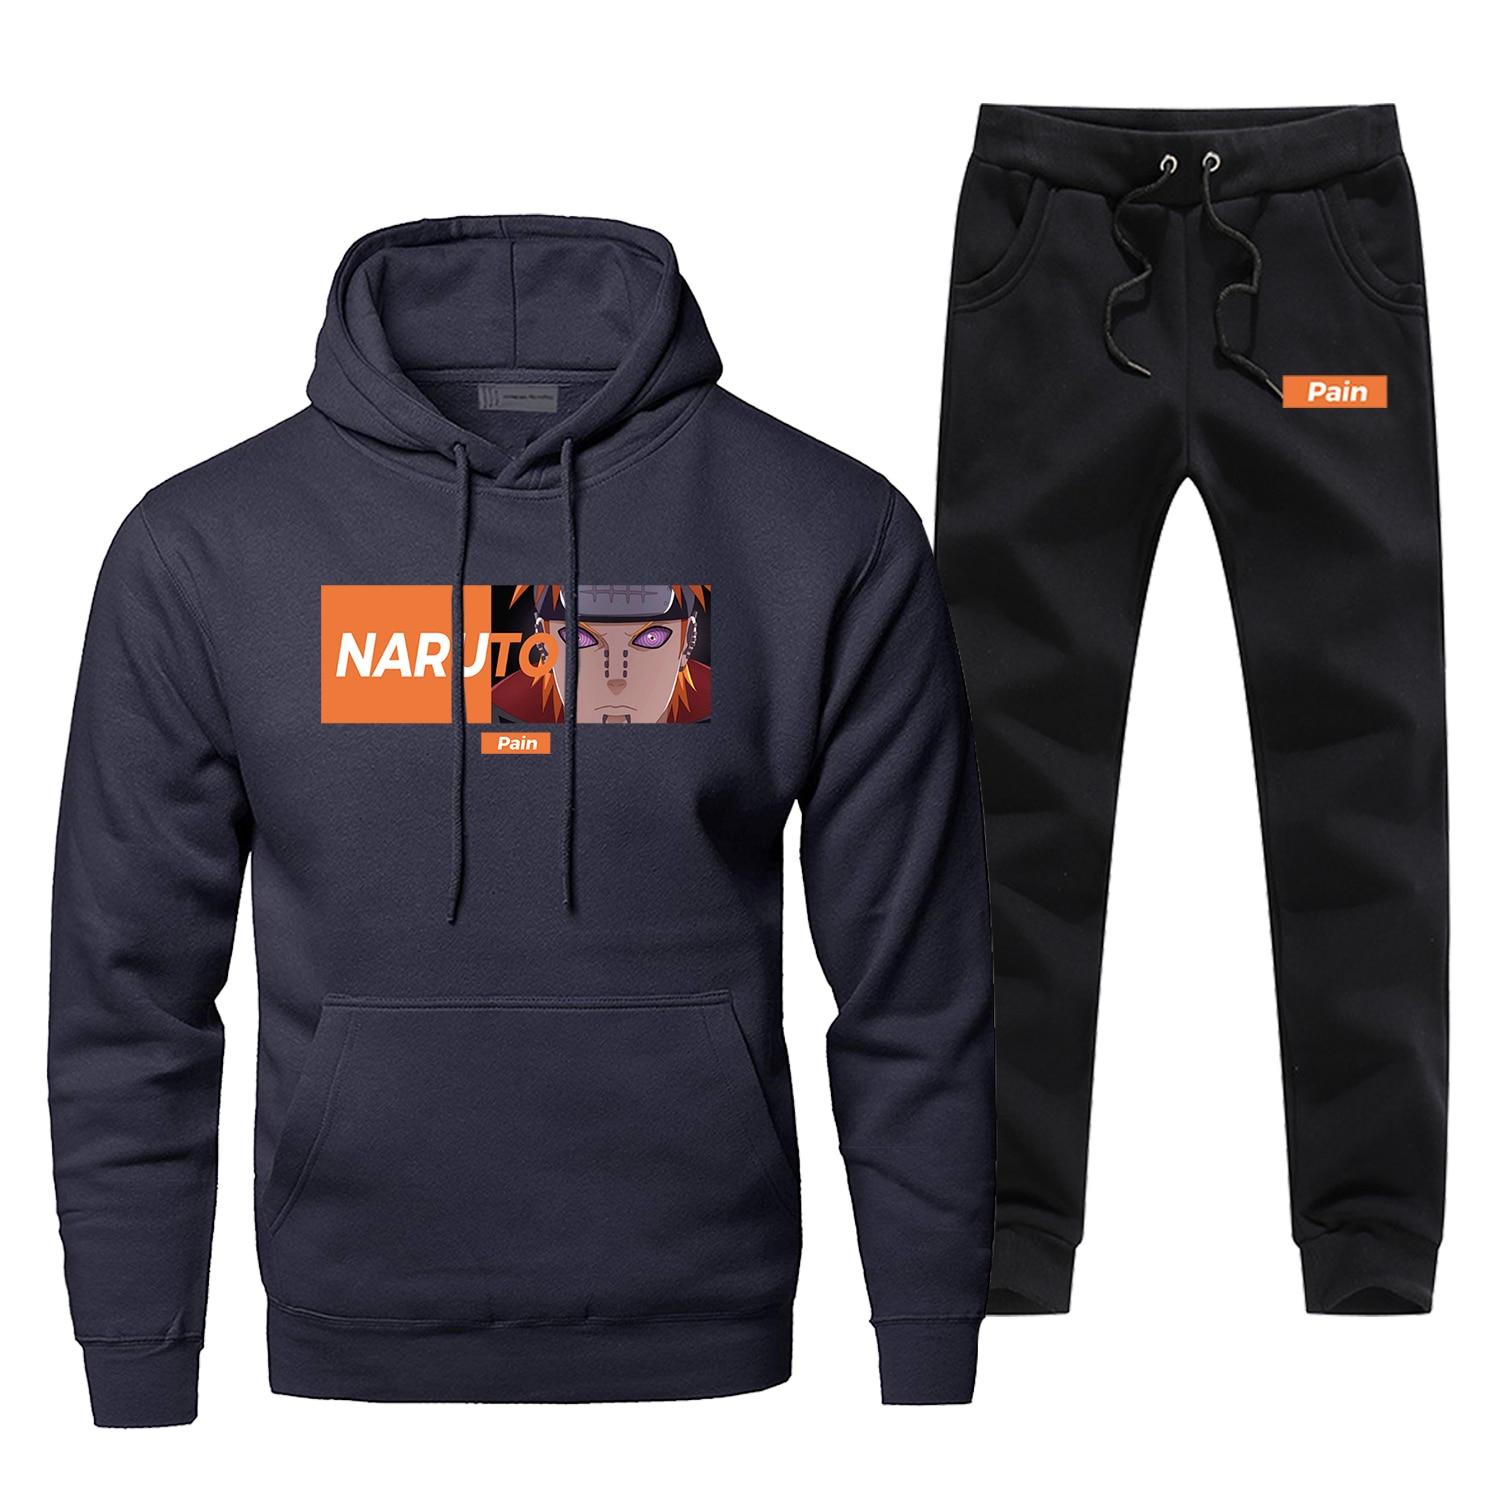 Japan Anime Tracksuit Naruto Akatsuki Pein Hoodies Pants 2pcs Sets Men Harajuku Sportswear Casual Fleece Streetwear Sweatpants